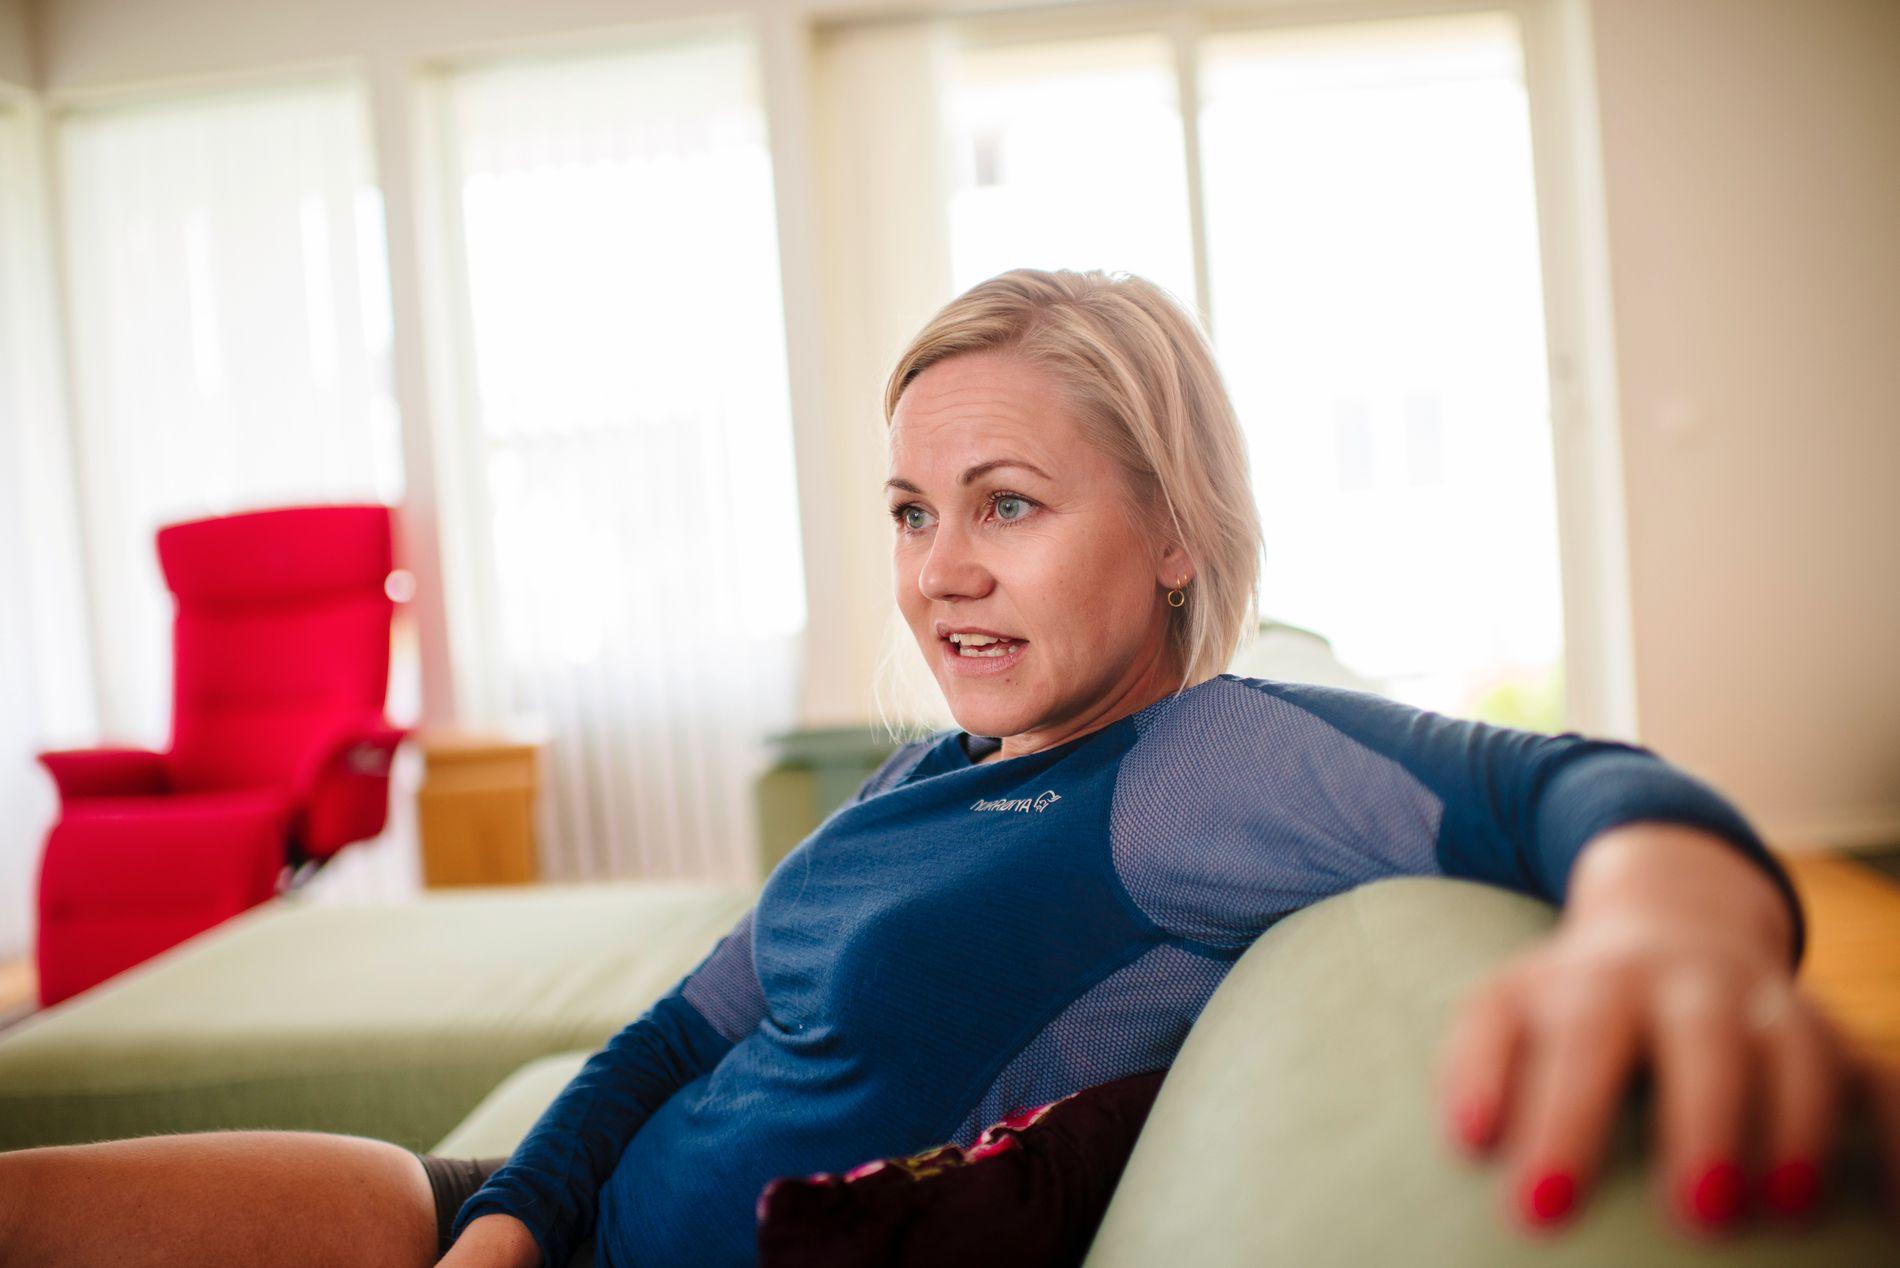 PSYKISK HELSE: Helsepolitisk talsperson Ingvild Kjerkol i Arbeiderpartiet holder fast på at det behøves en egen handlingsplan for eldres psykiske helse.